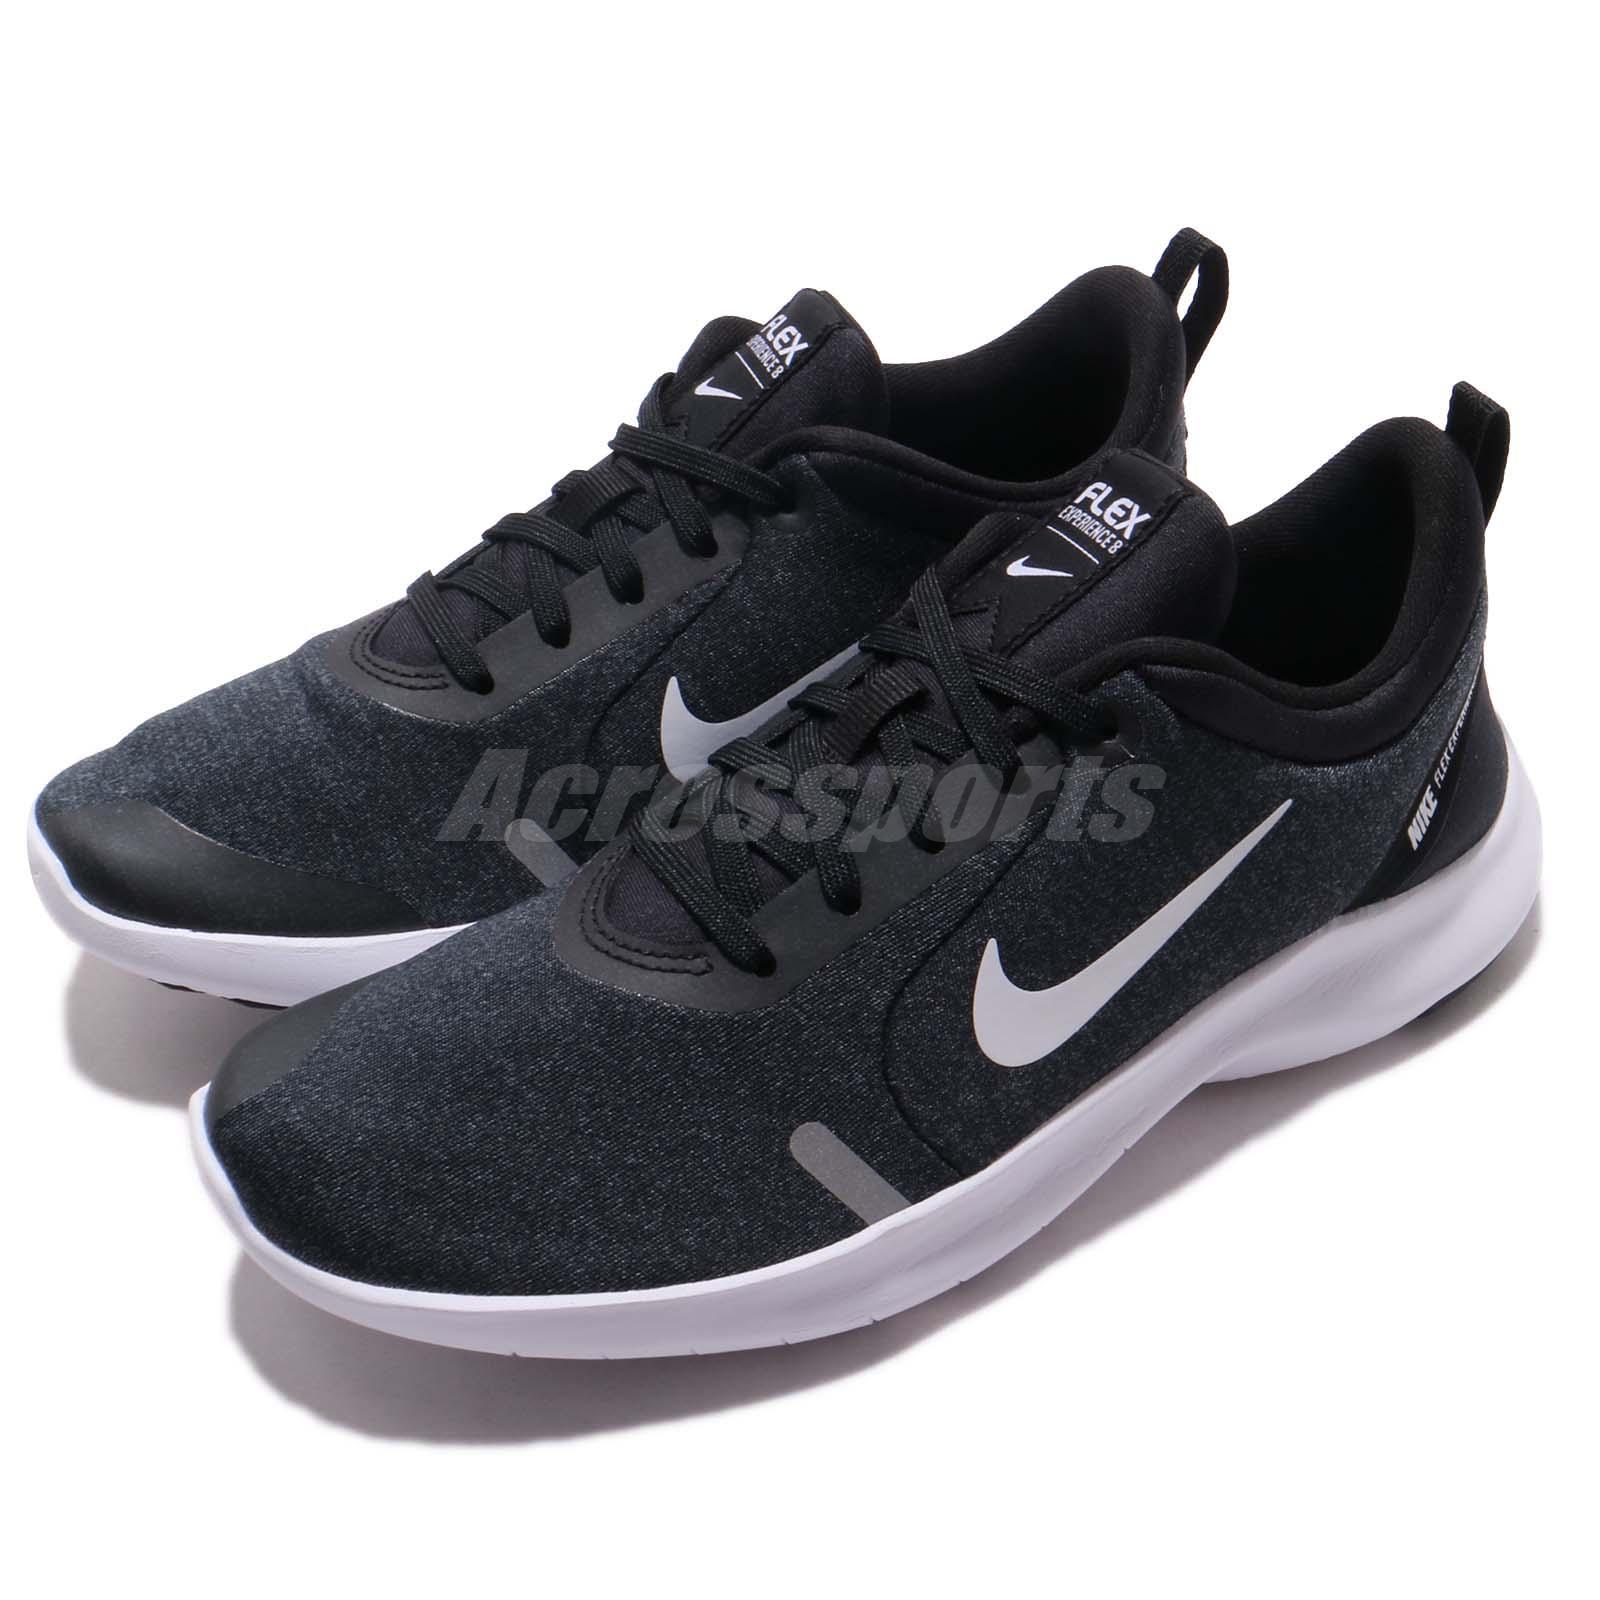 5d3c15db32e Details about Nike Wmns Flex Experience RN 8 Run Black White Women Running  Shoes AJ5908-013